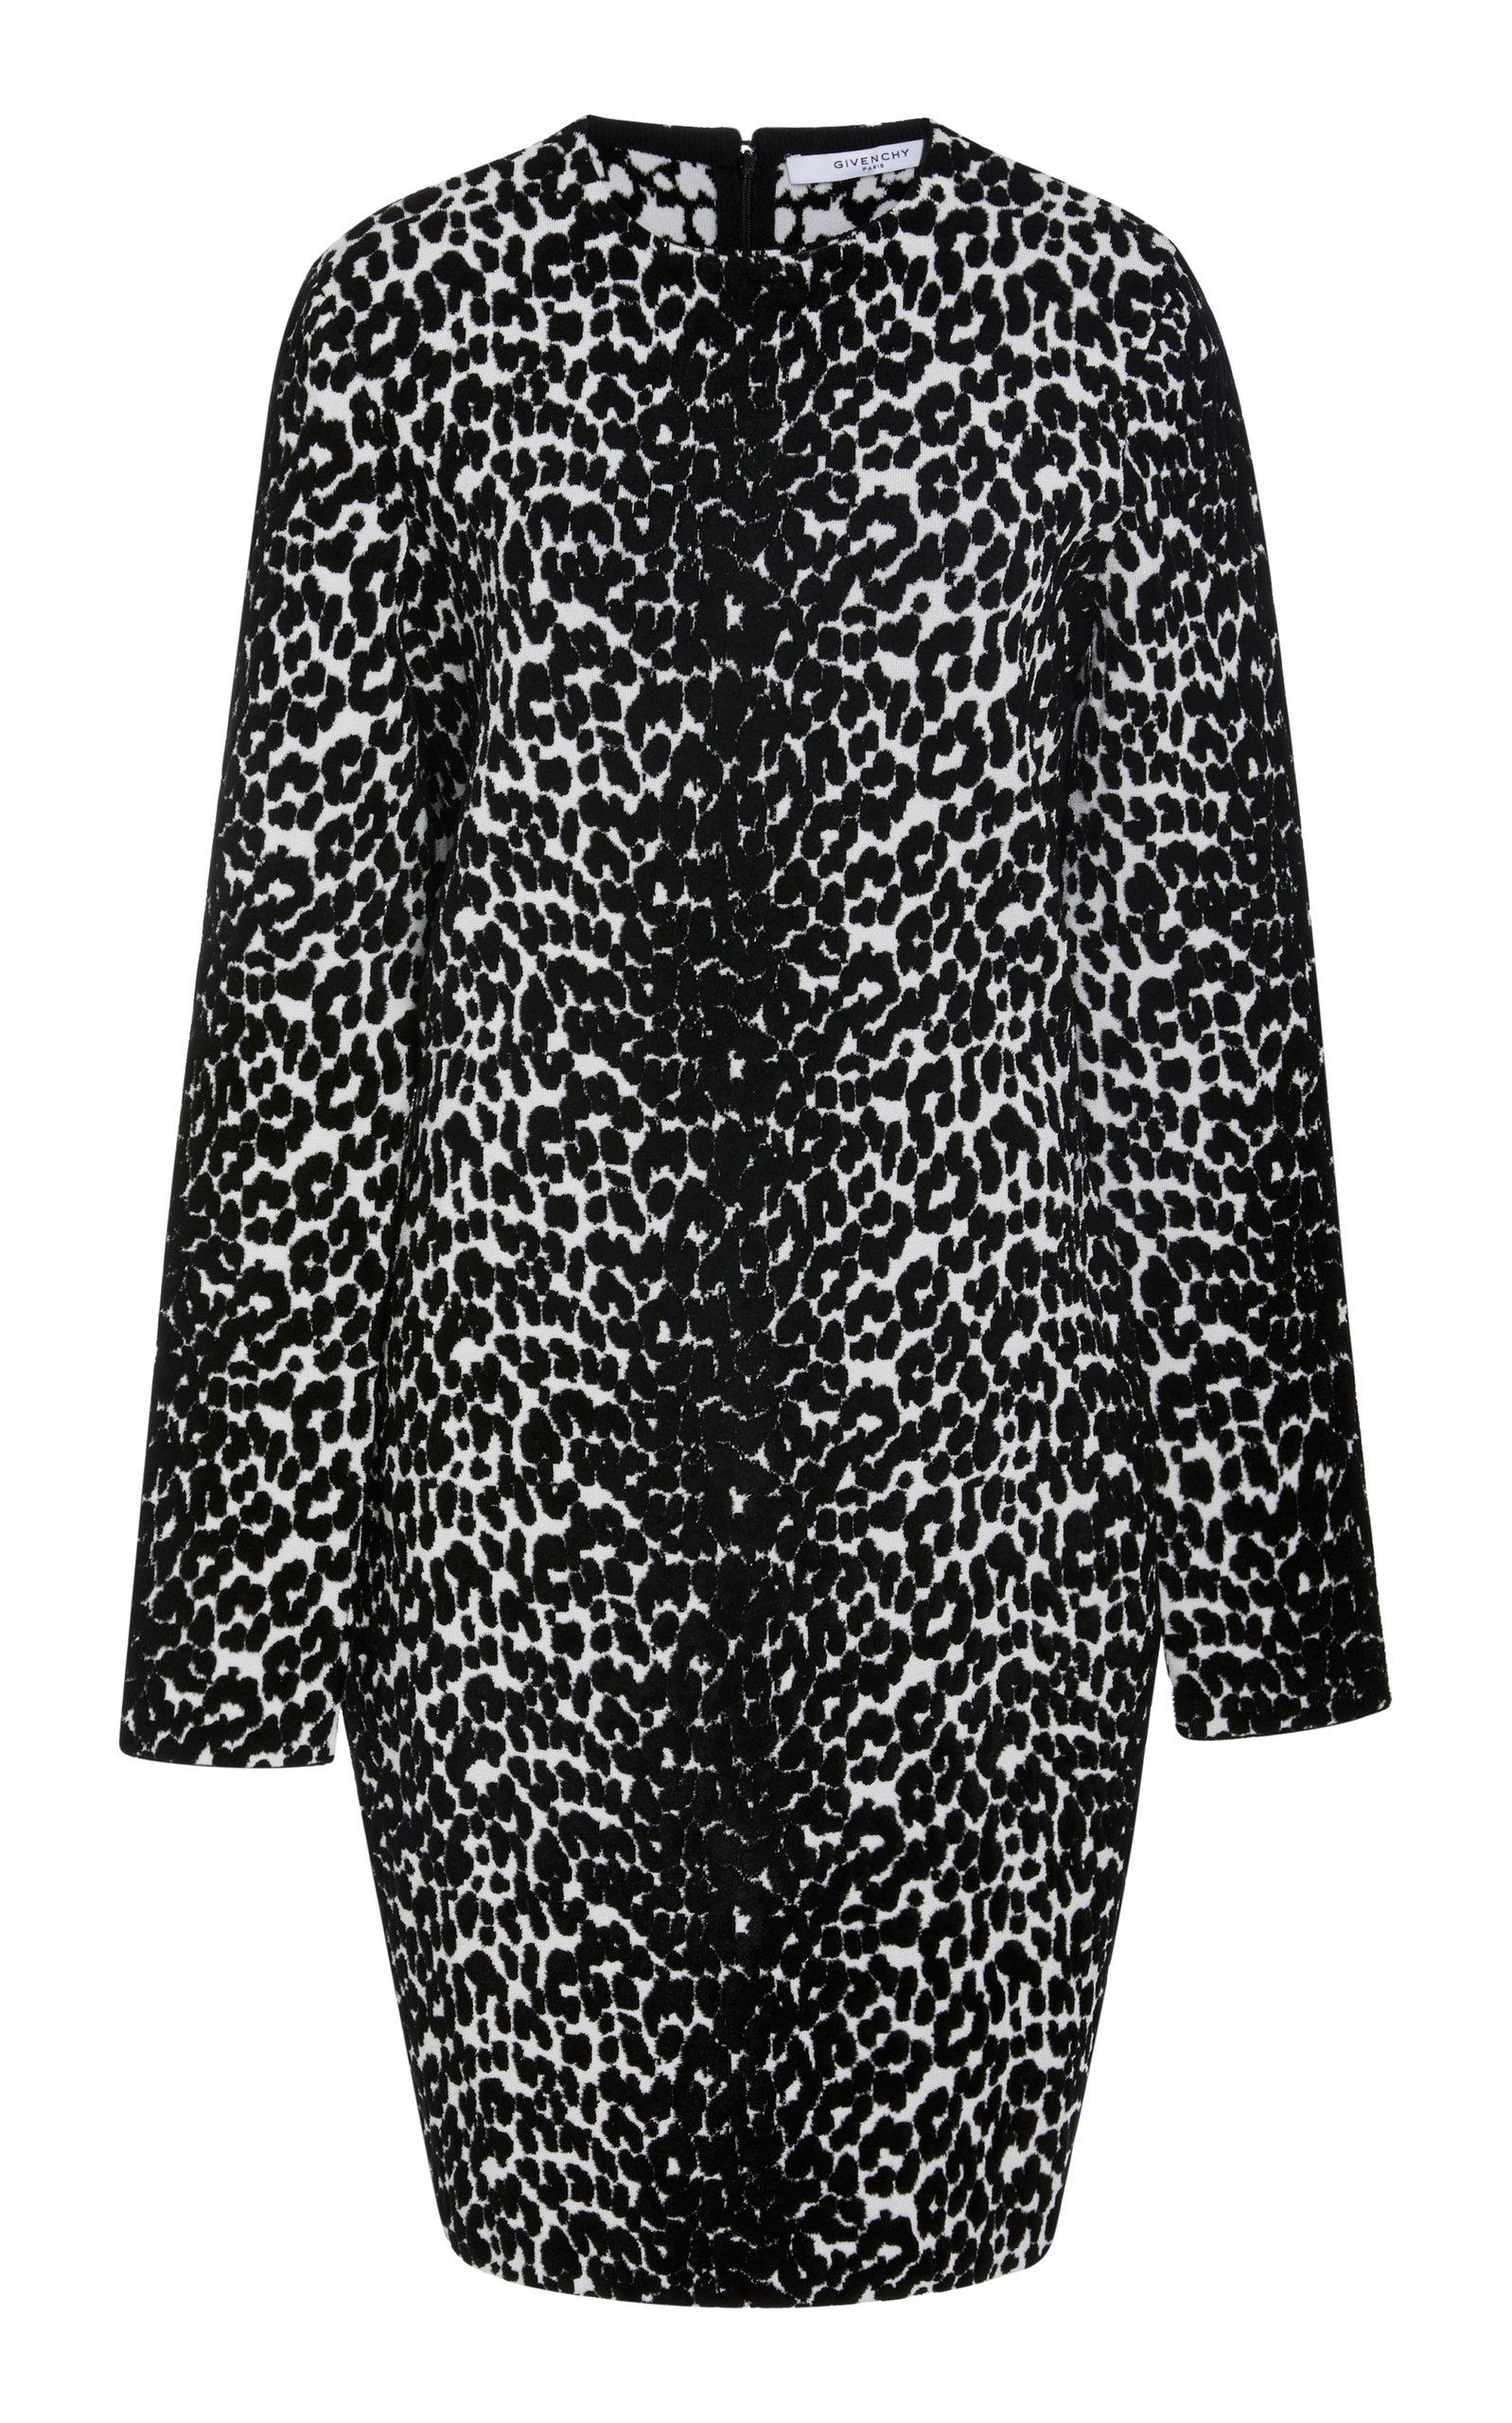 Givenchy - Black Leopard-print Stretch-knit Mini Dress - Lyst. View  fullscreen 176716a97